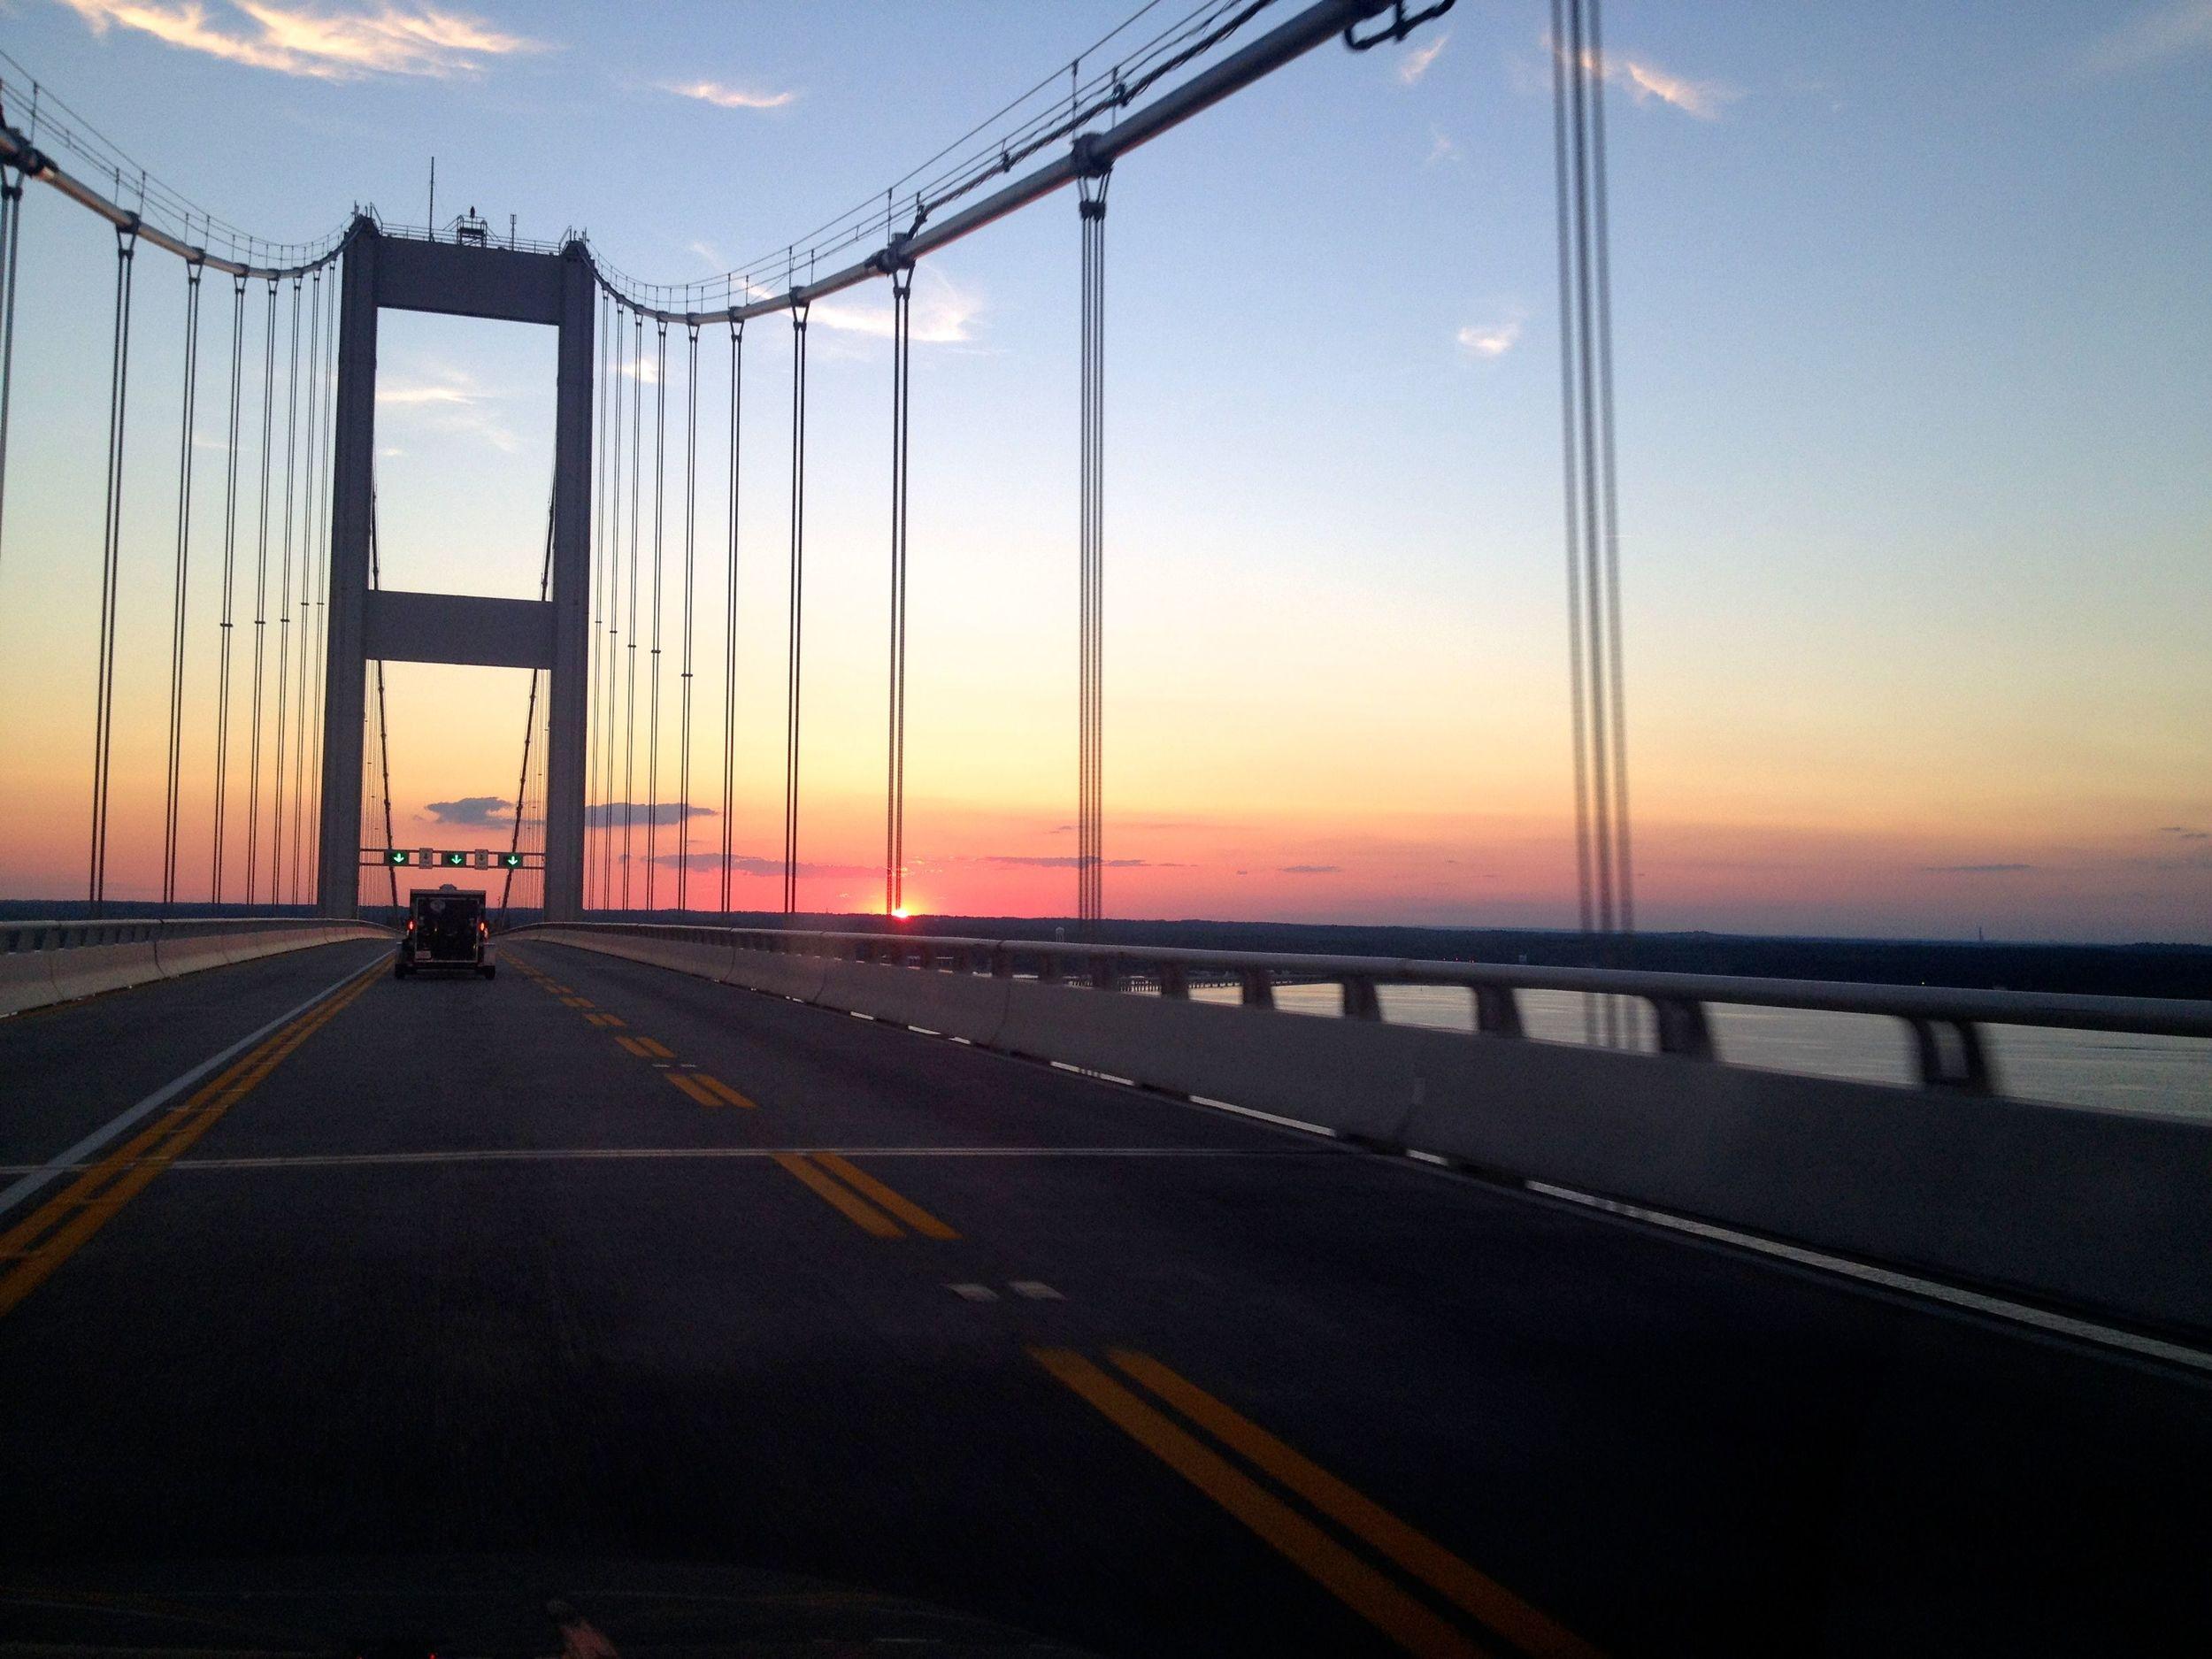 Sunset over the Bay Bridge